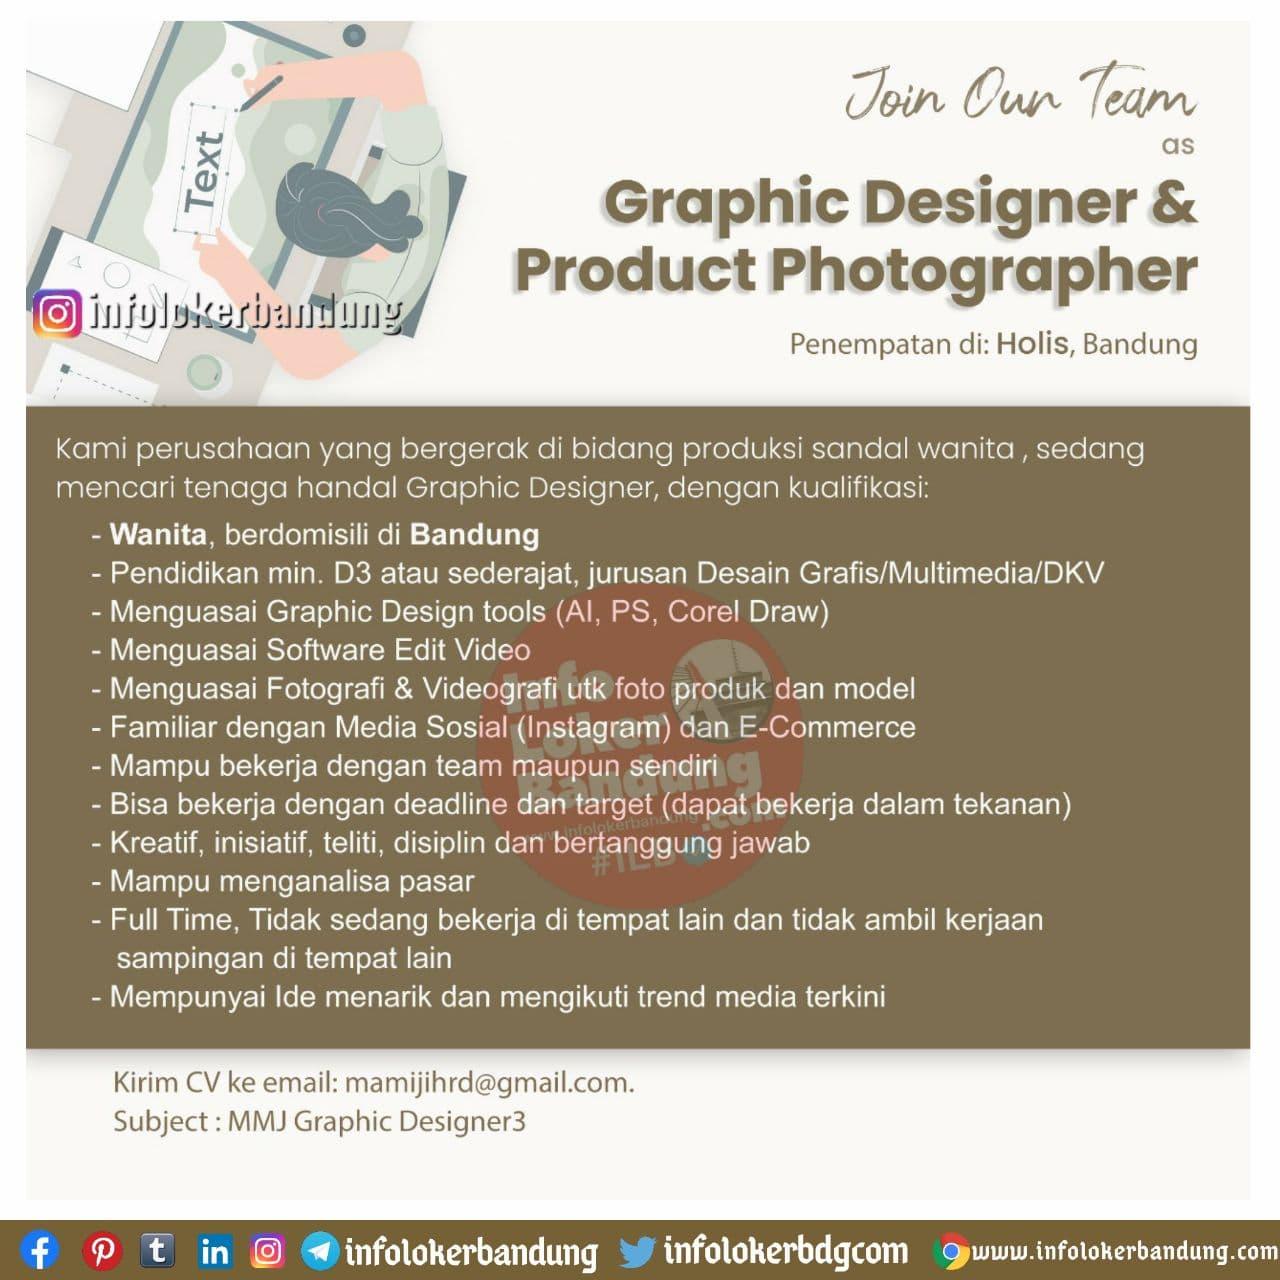 Lowongan Kerja Graphic Designer & Product Photographer Mamiji Bandung November 2020